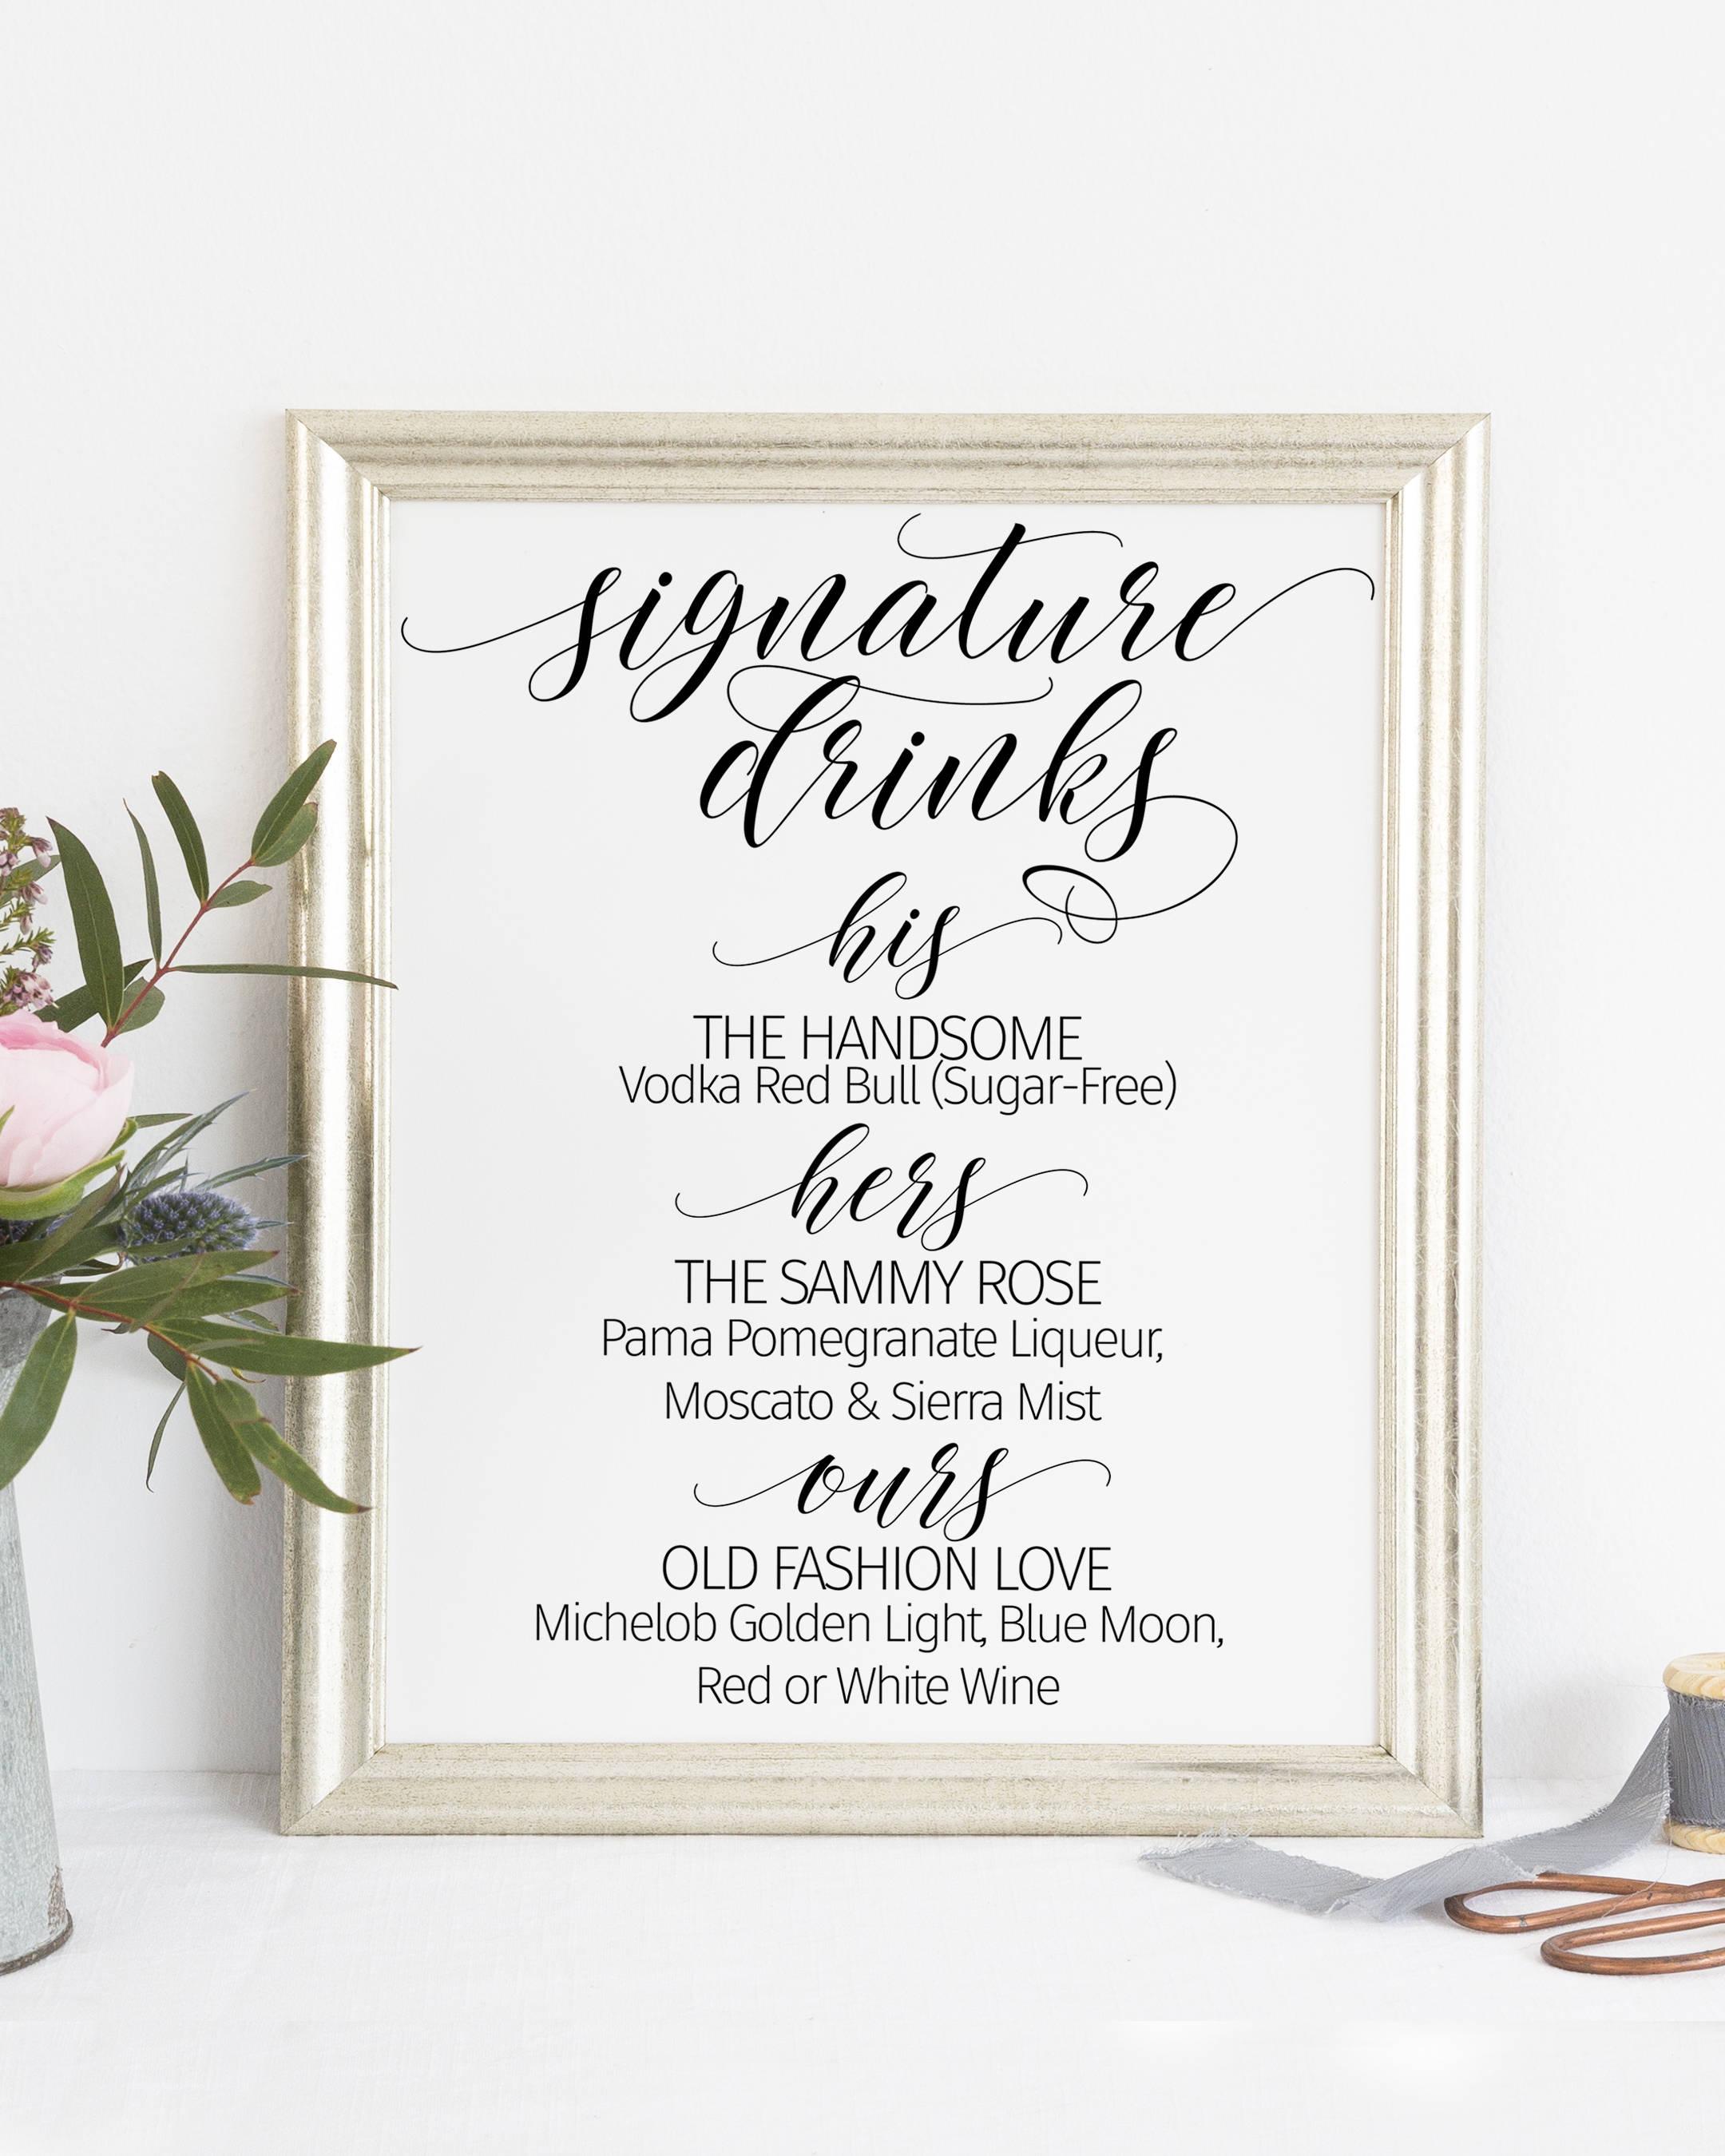 Printable. Signature drinks sign bar sign wedding bar sign | Etsy